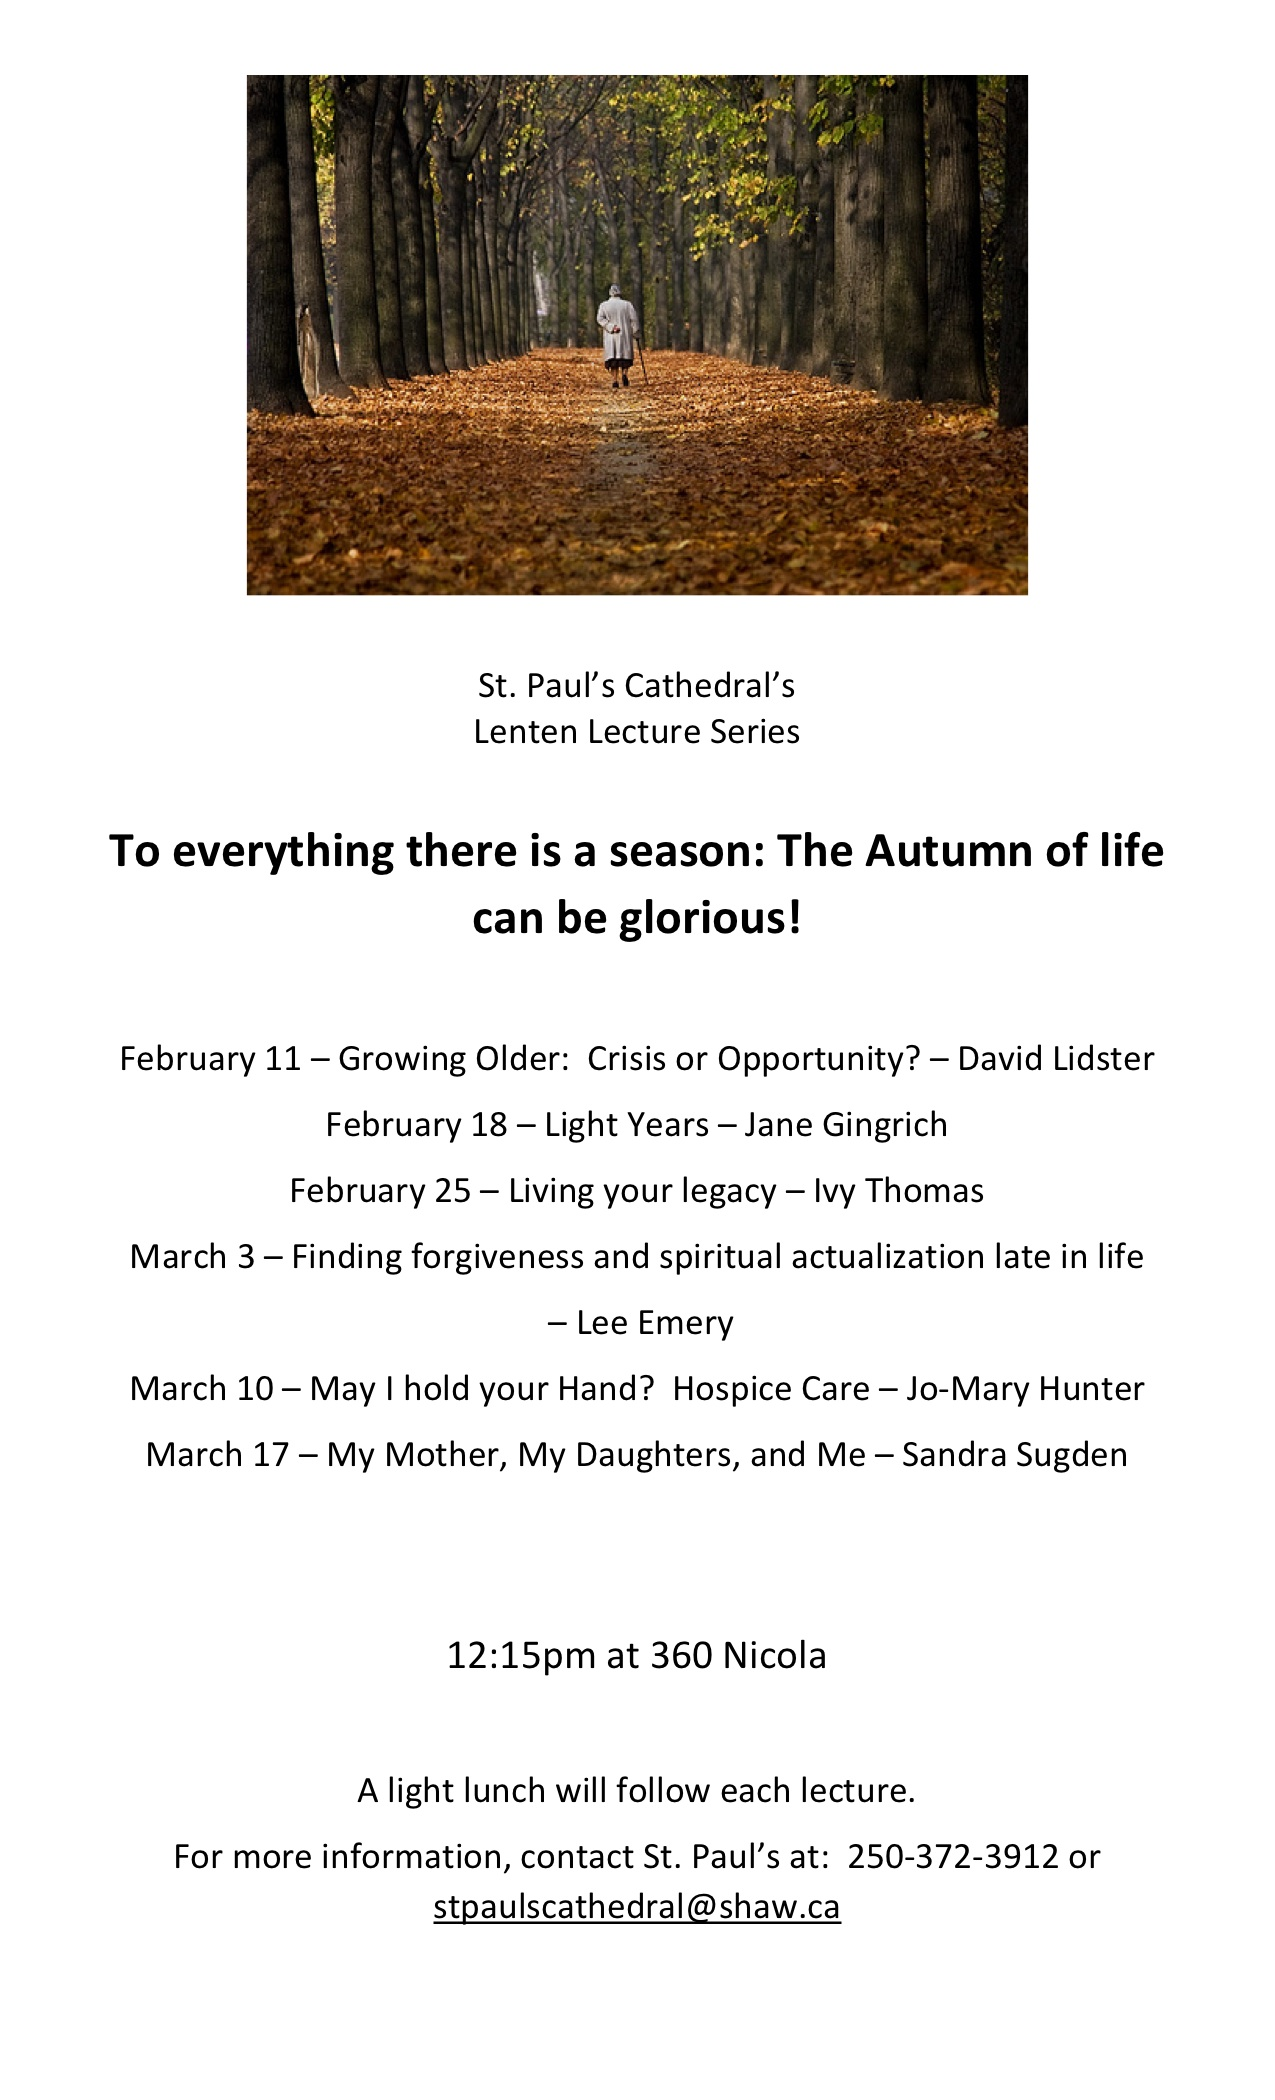 Lenten Lectures Poster 2016